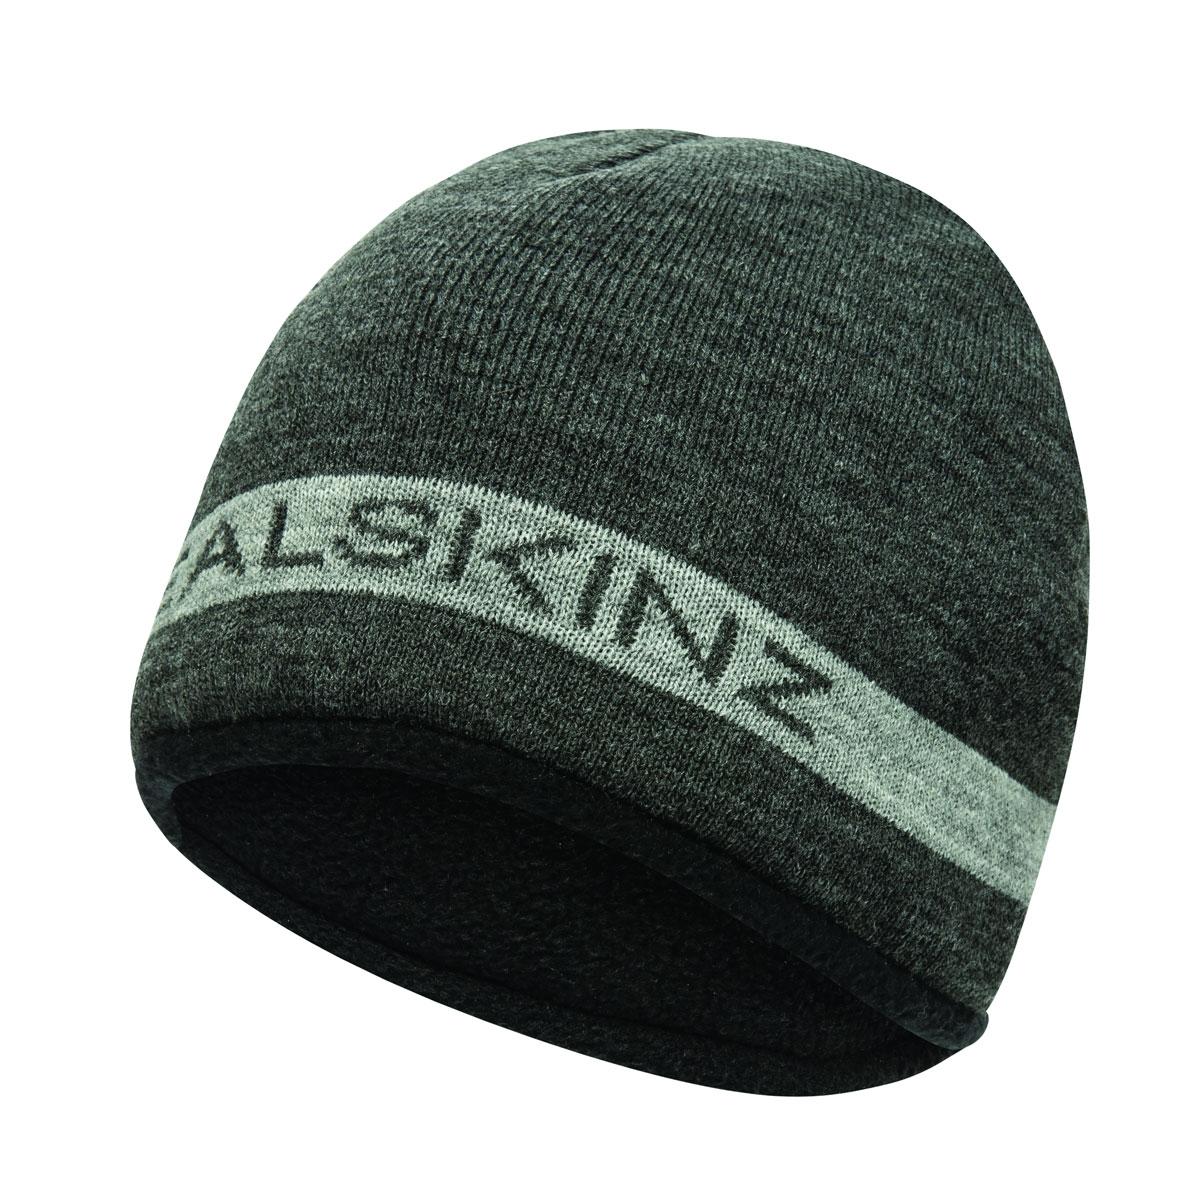 Image of SealSkinz Thetford Beanie - Grey b6b4932a5242